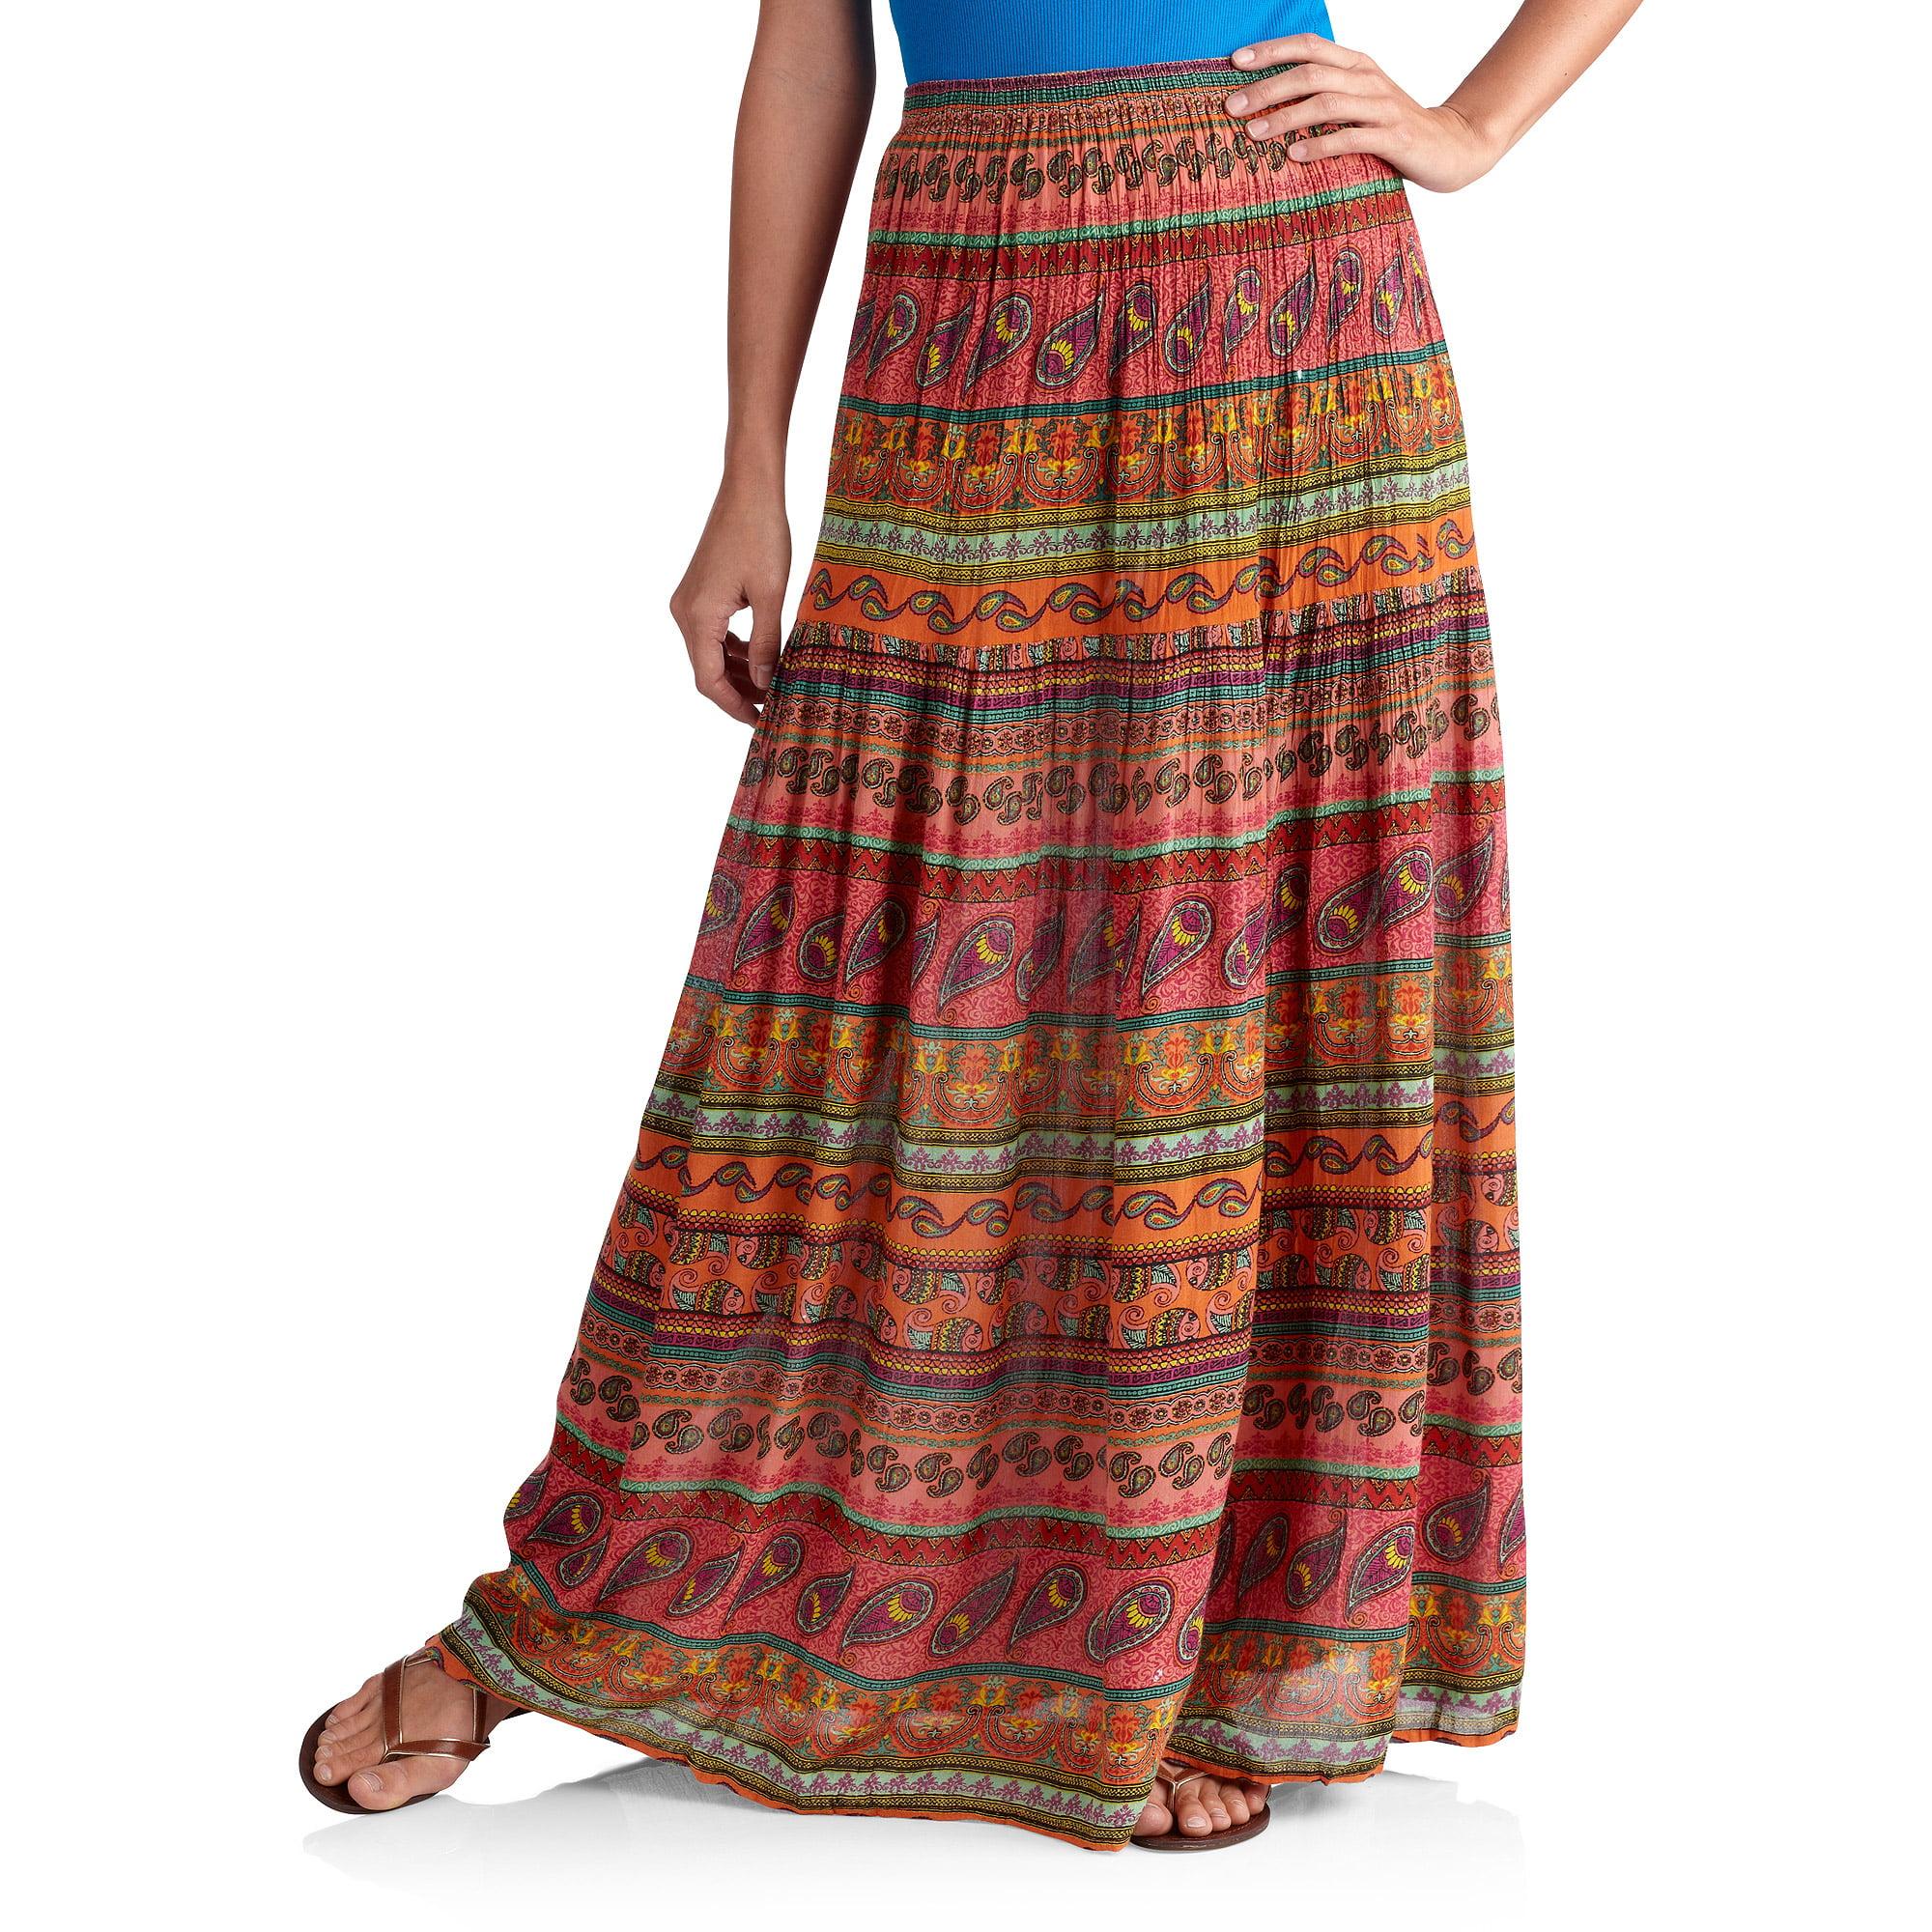 Women's Printed Krinkle Boho Skirt